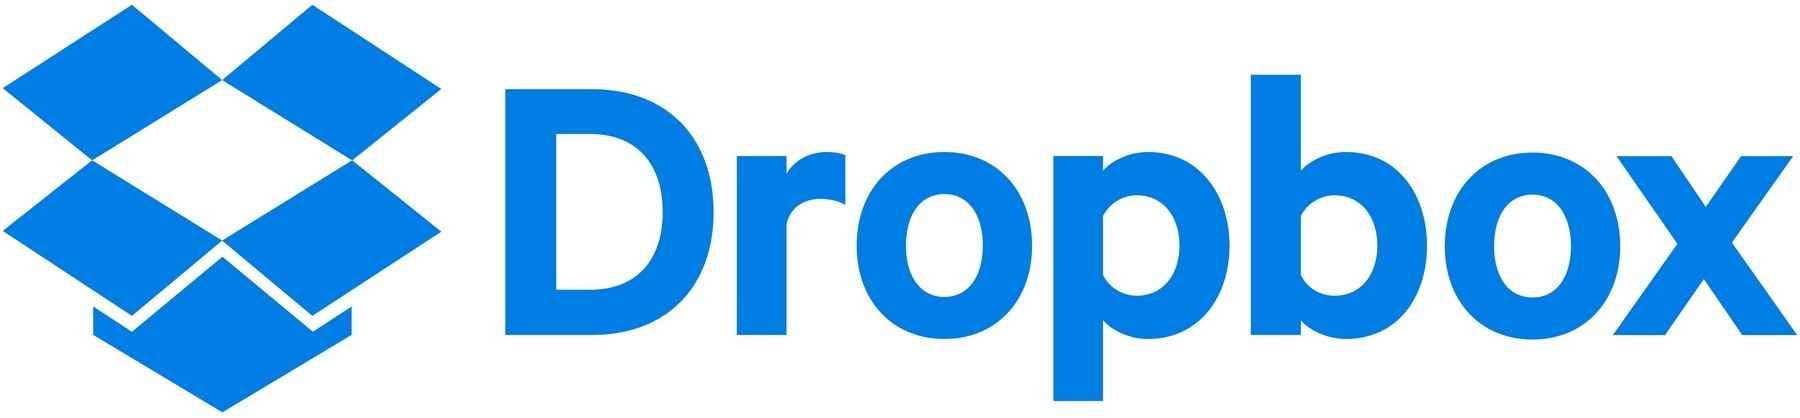 dropbox_logo1